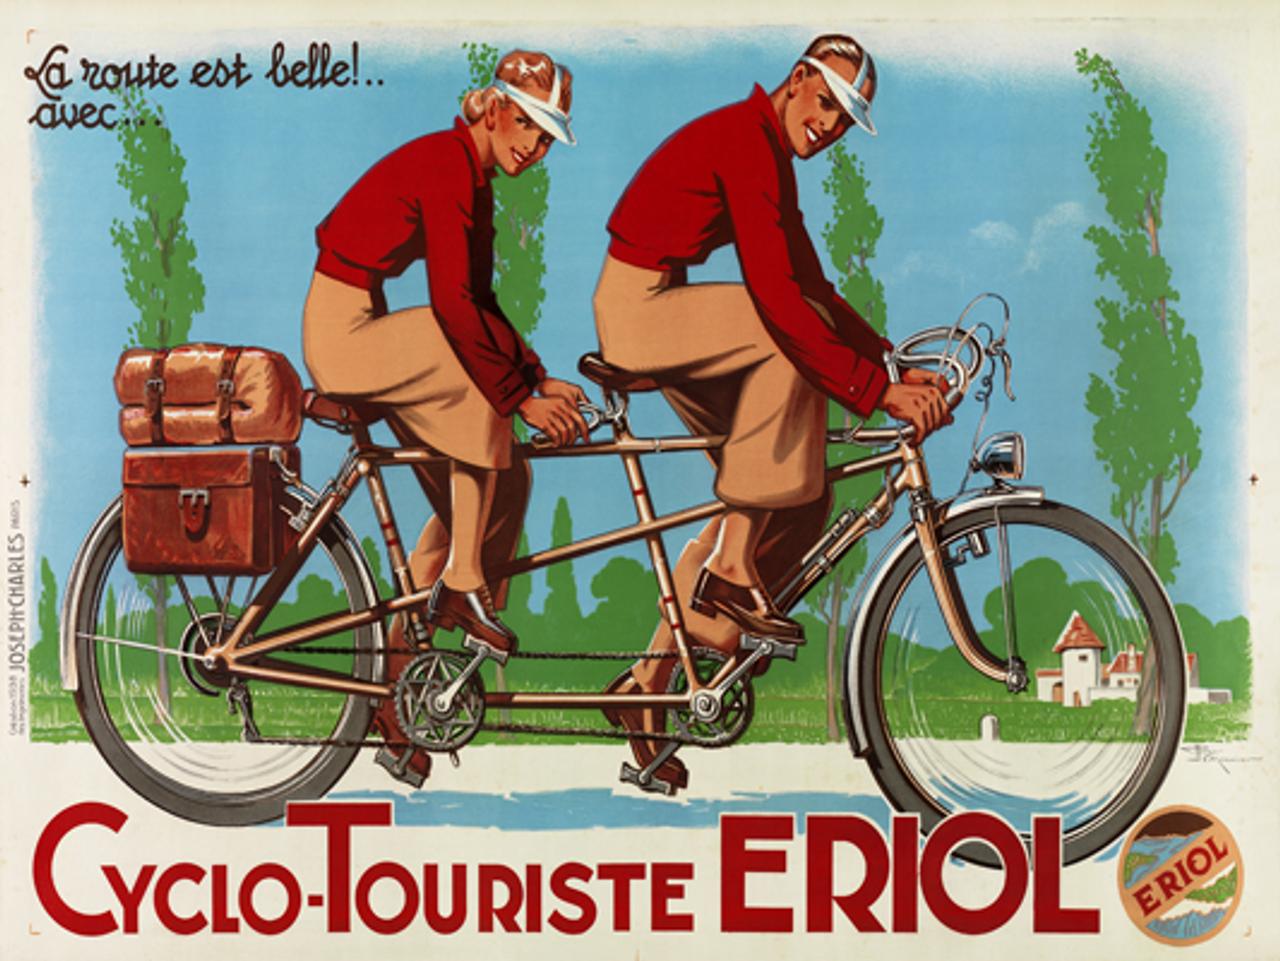 Cyclo-Touriste EROL Tandem Bicycle Poster